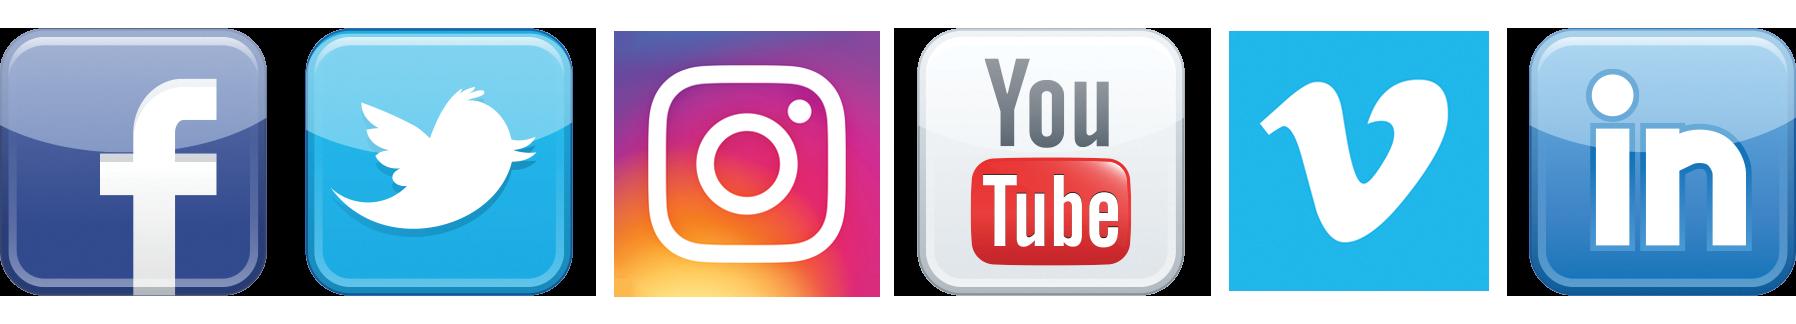 social media policy icon